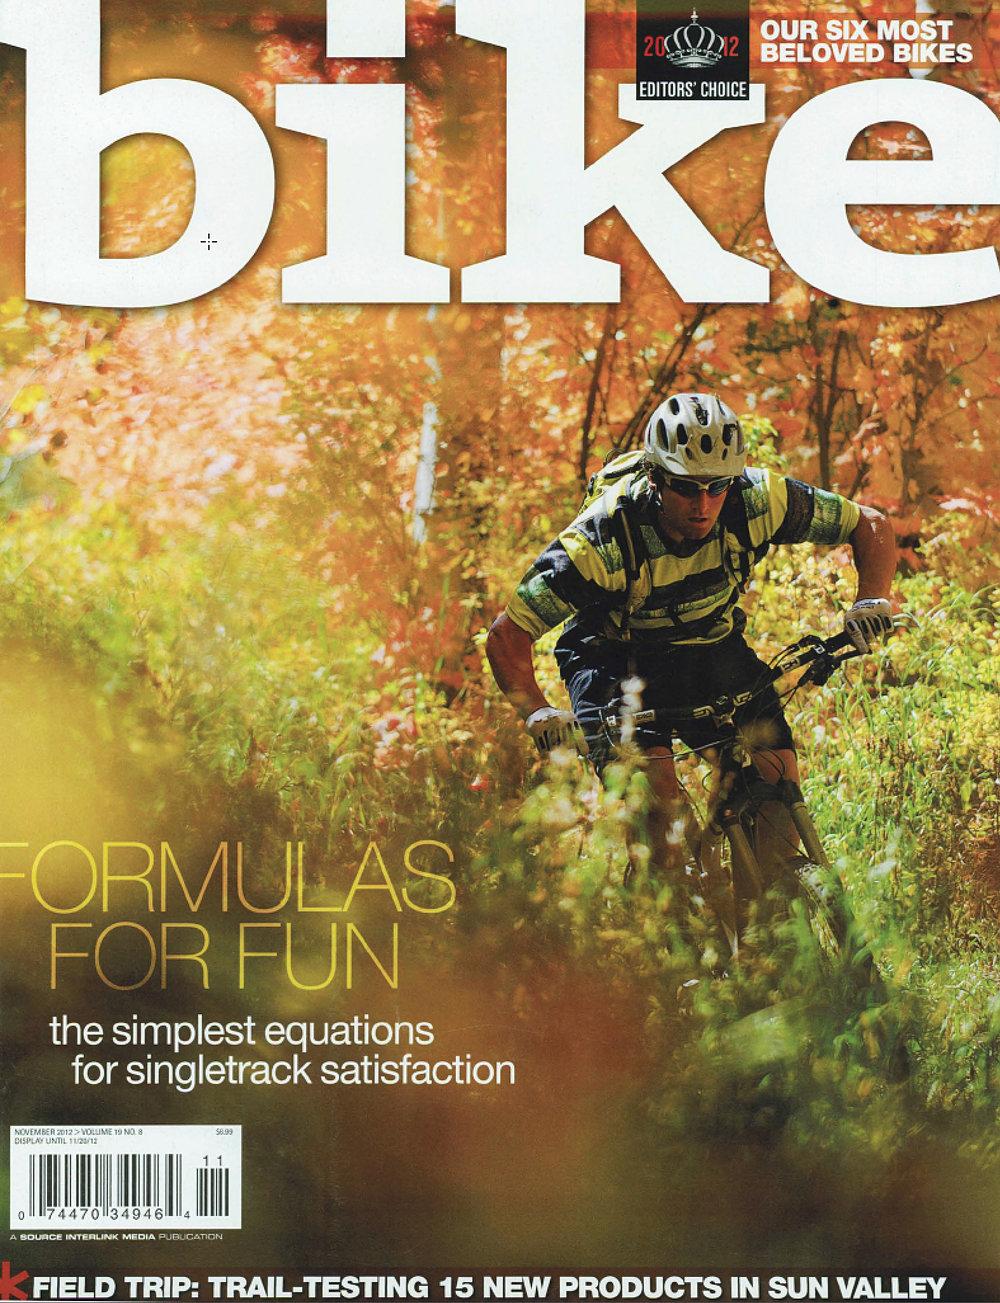 Bike Magazine, Fall 2012